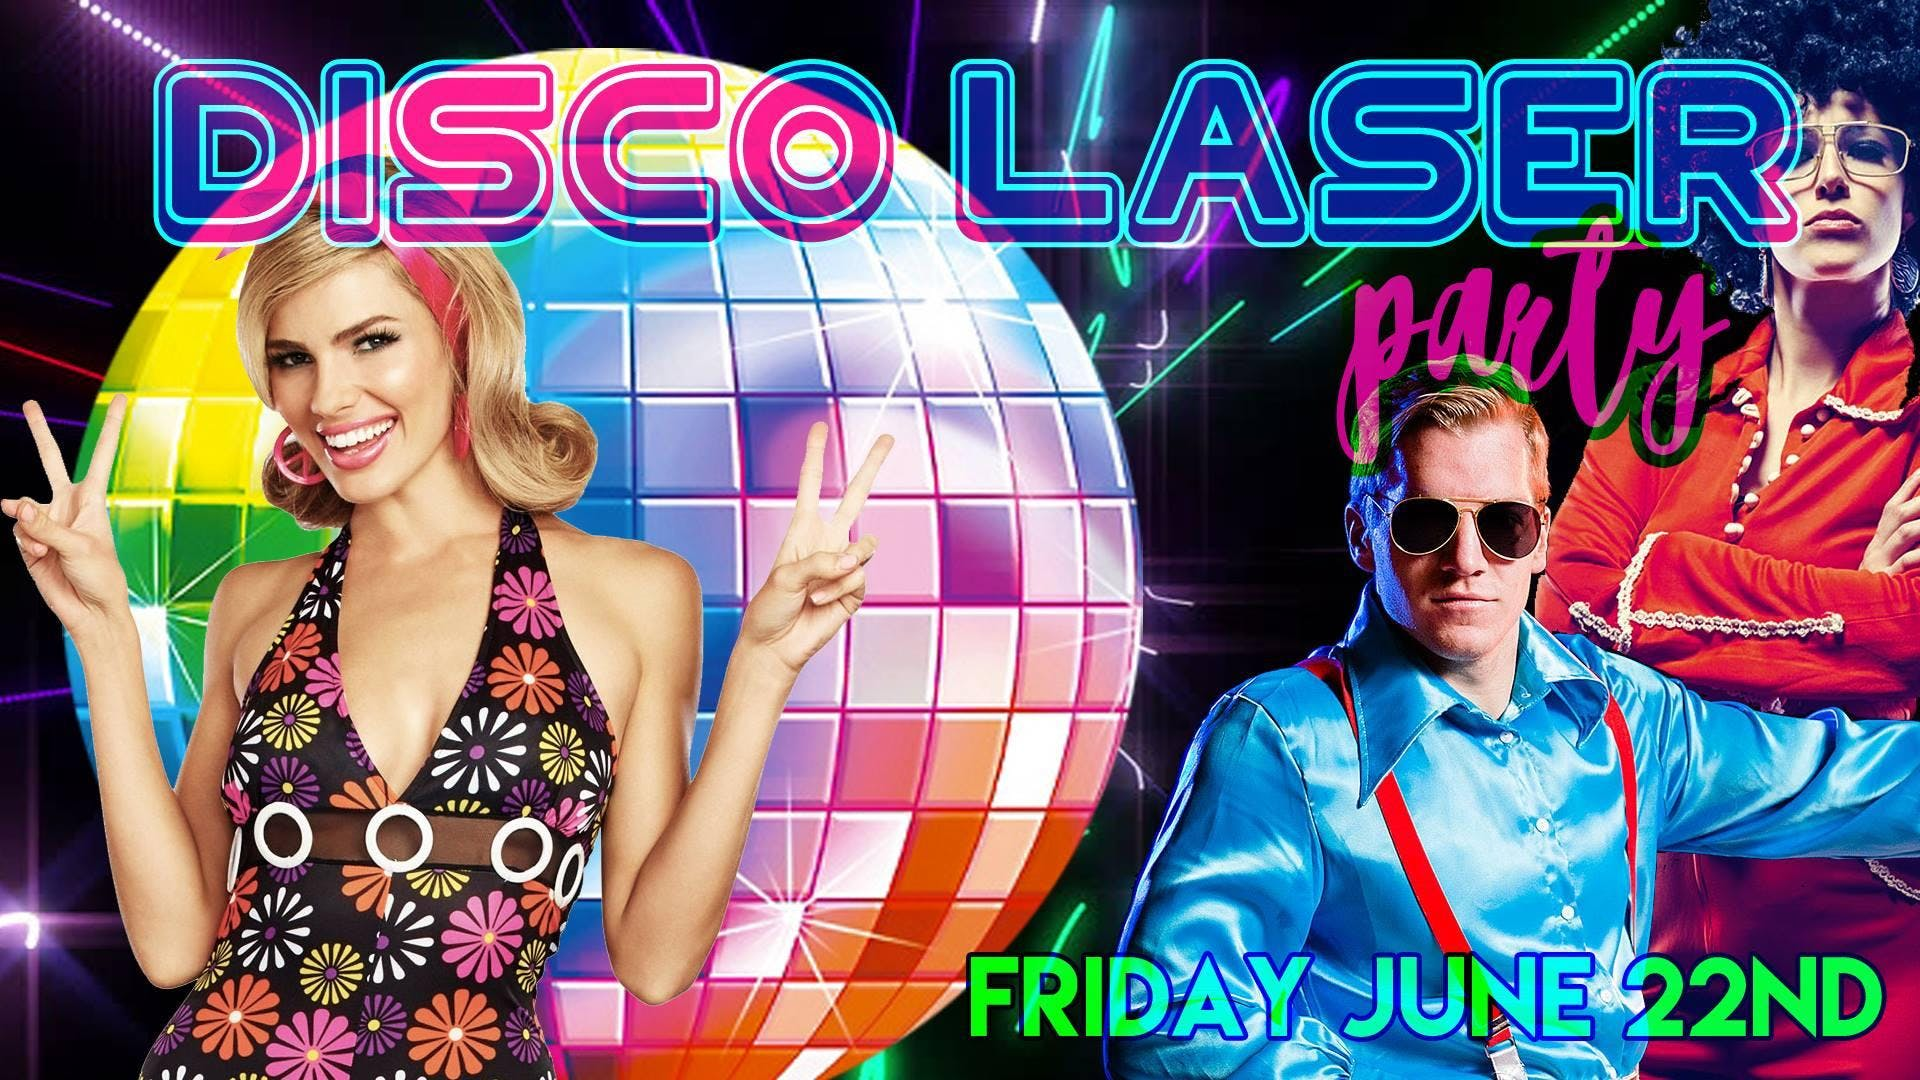 Disco Laser Dance Party